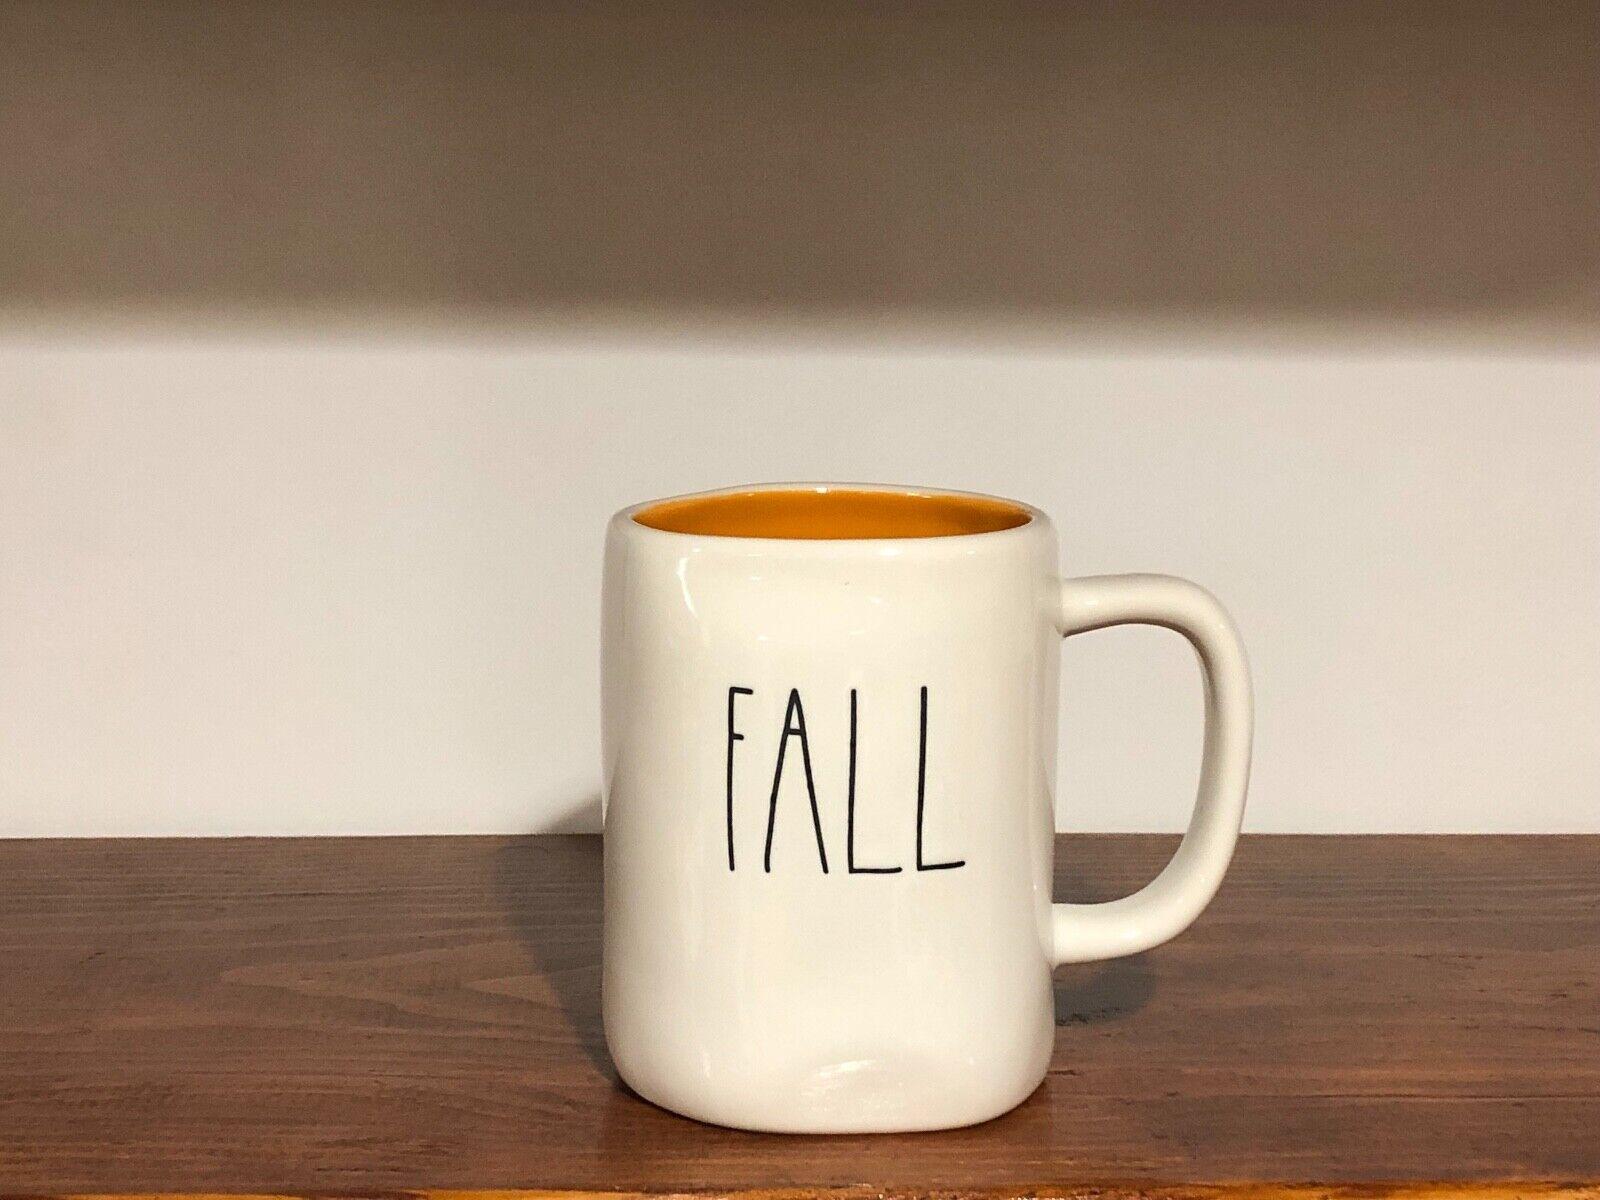 Rae Dunn Artisan Collection By Magenta Farmhouse LL Large Letter Coffee Tea Mug FALL Y'ALL